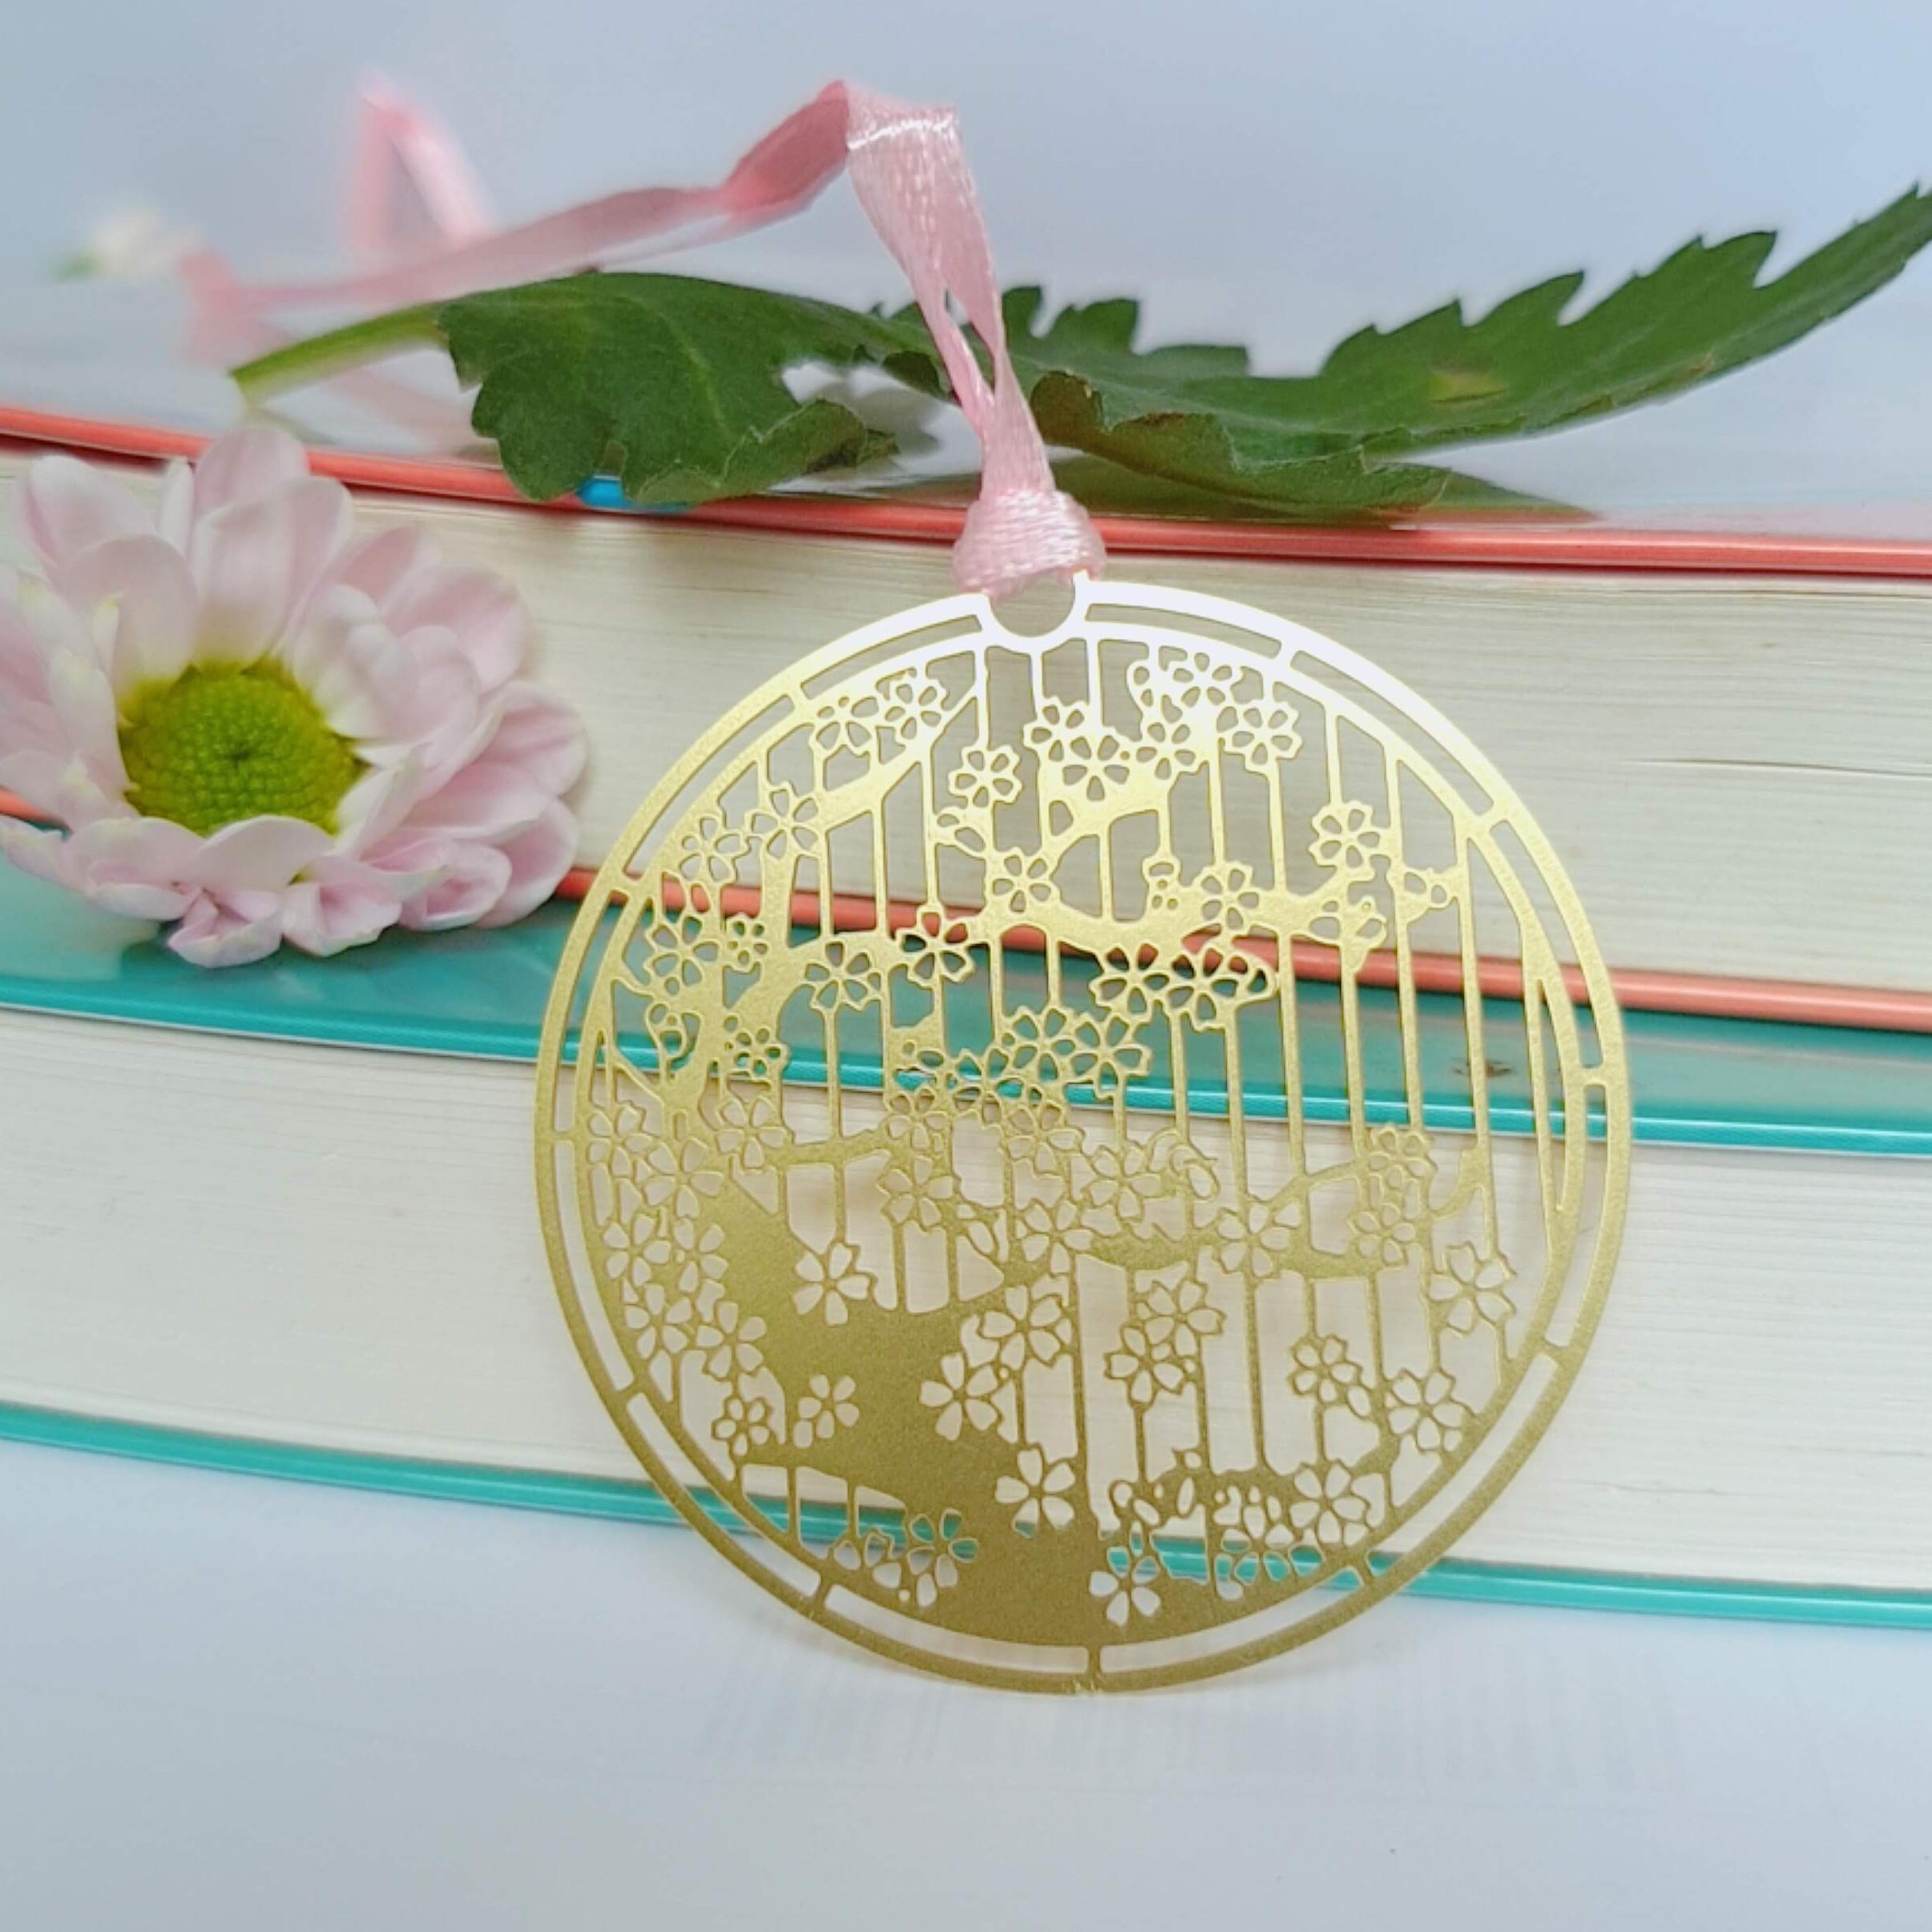 Bookmark kim loại họa tiết sakura hình tròn 02